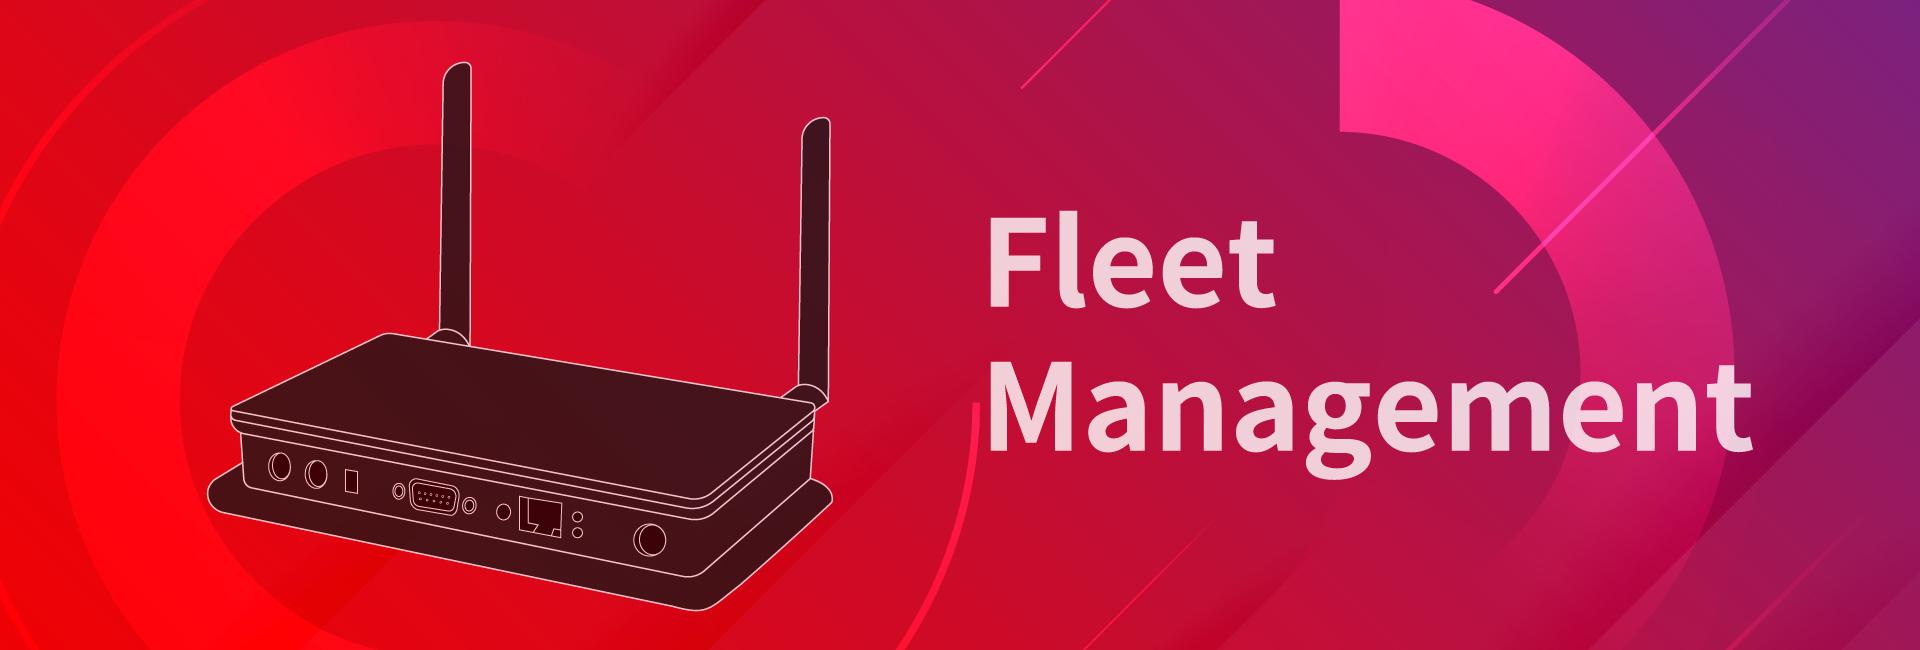 Fleet Management車隊管理